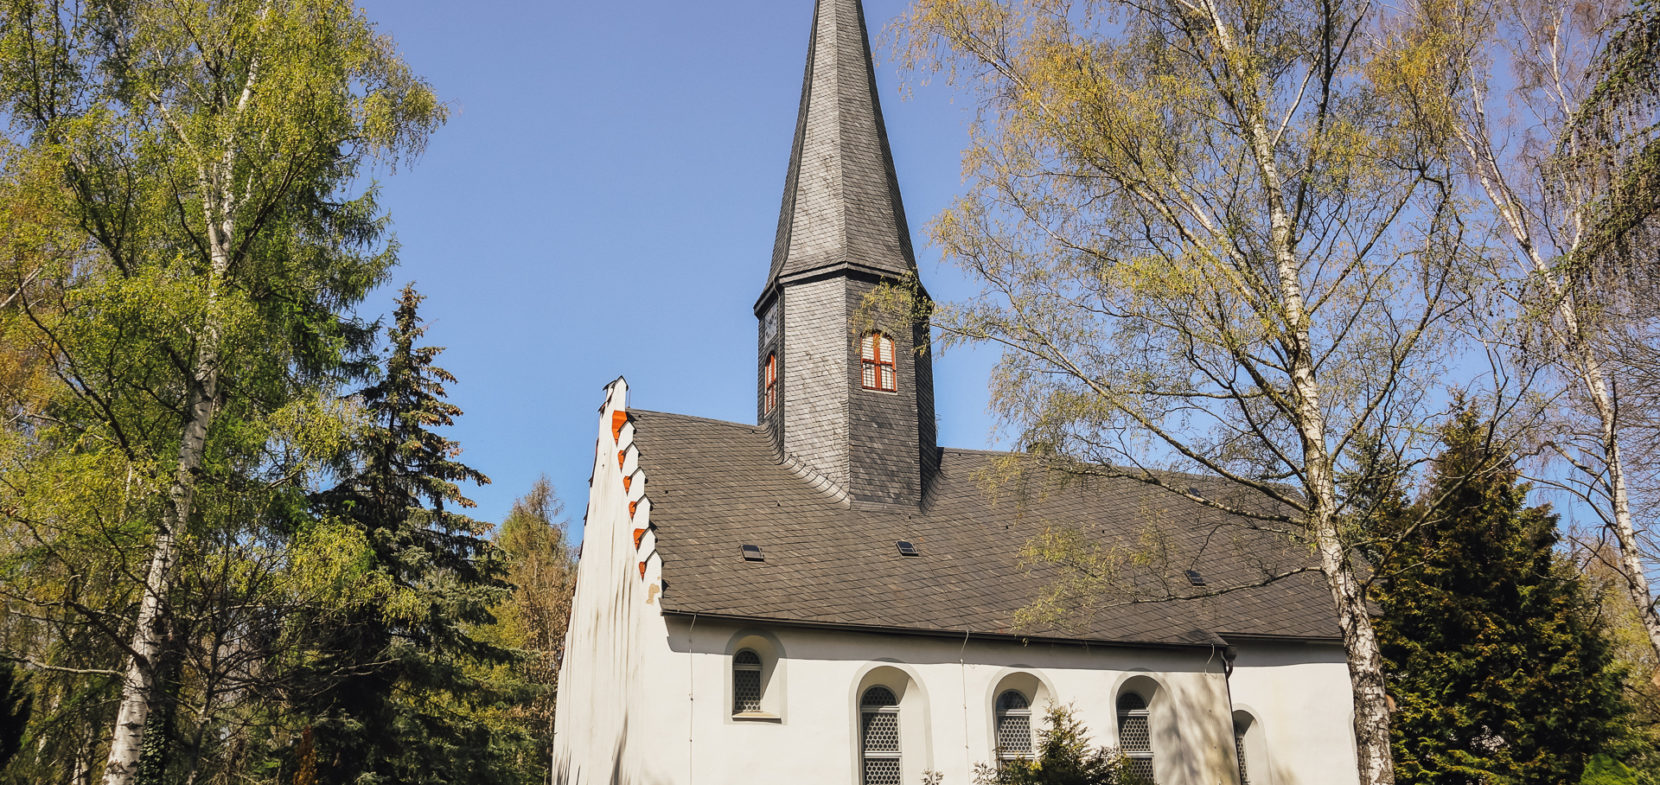 St. Johannis Langenhessen